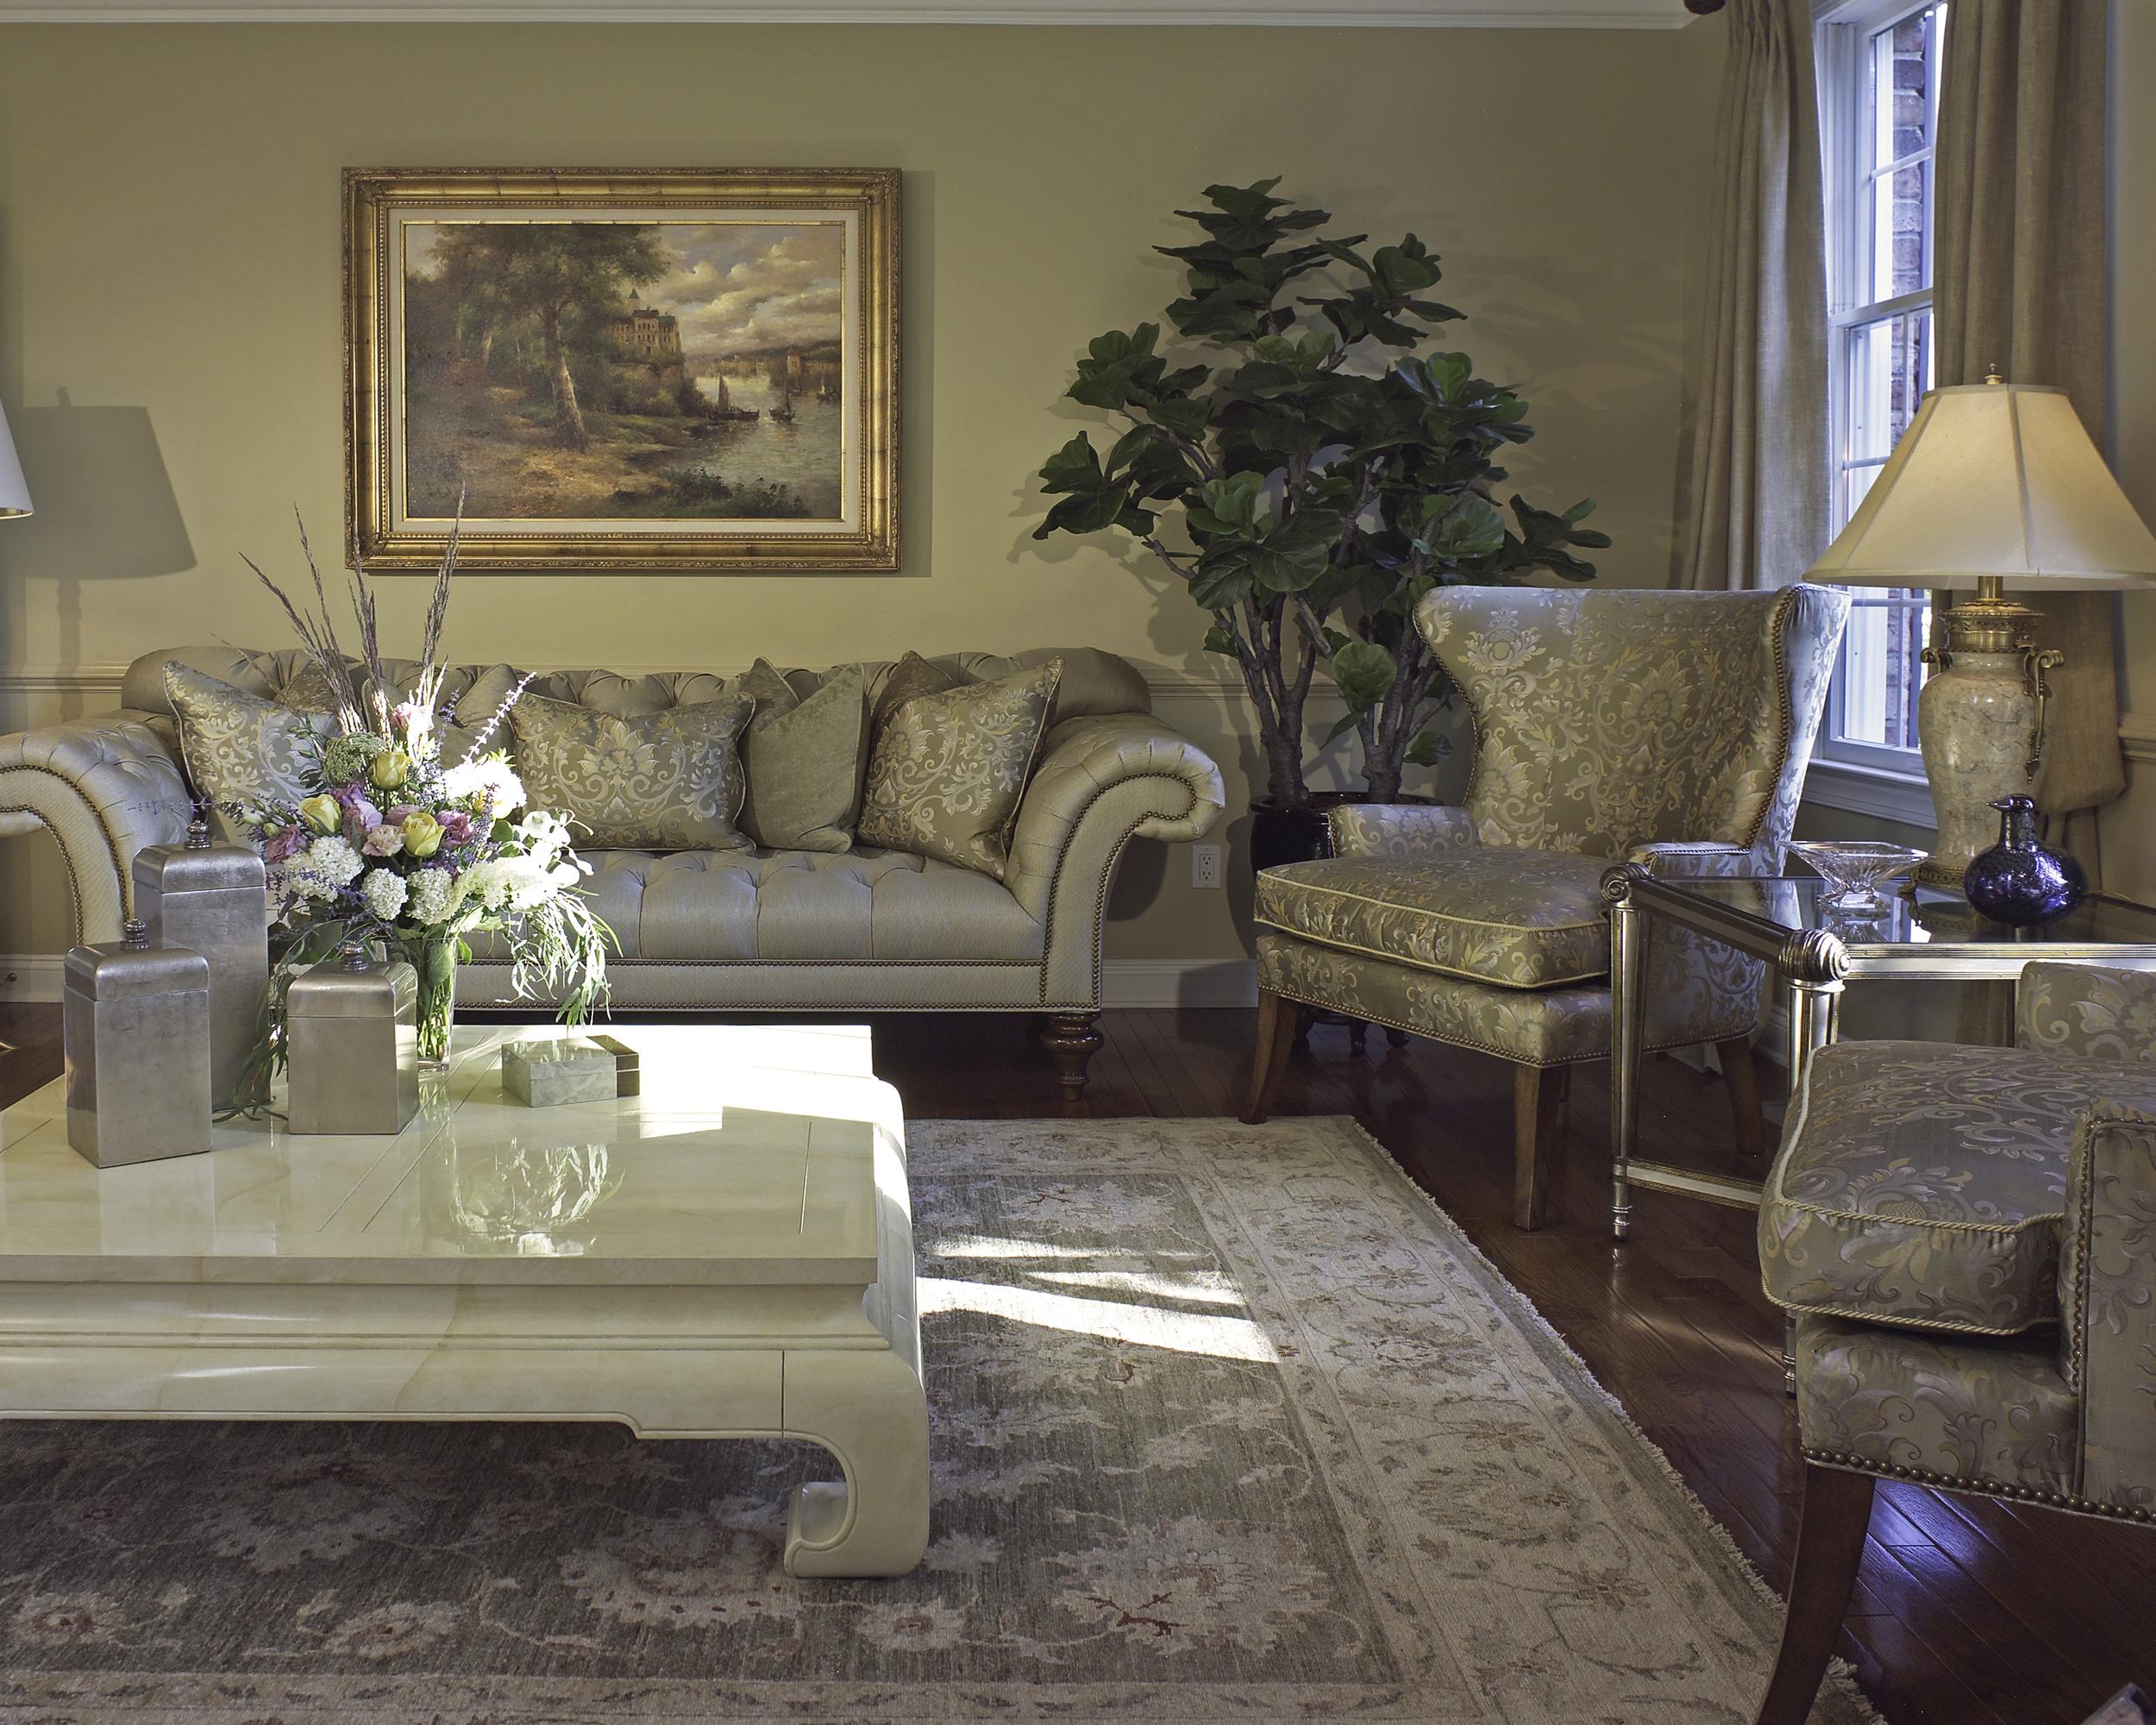 wendy-ryan-interior-design-novi-lakefront-home-10.JPG